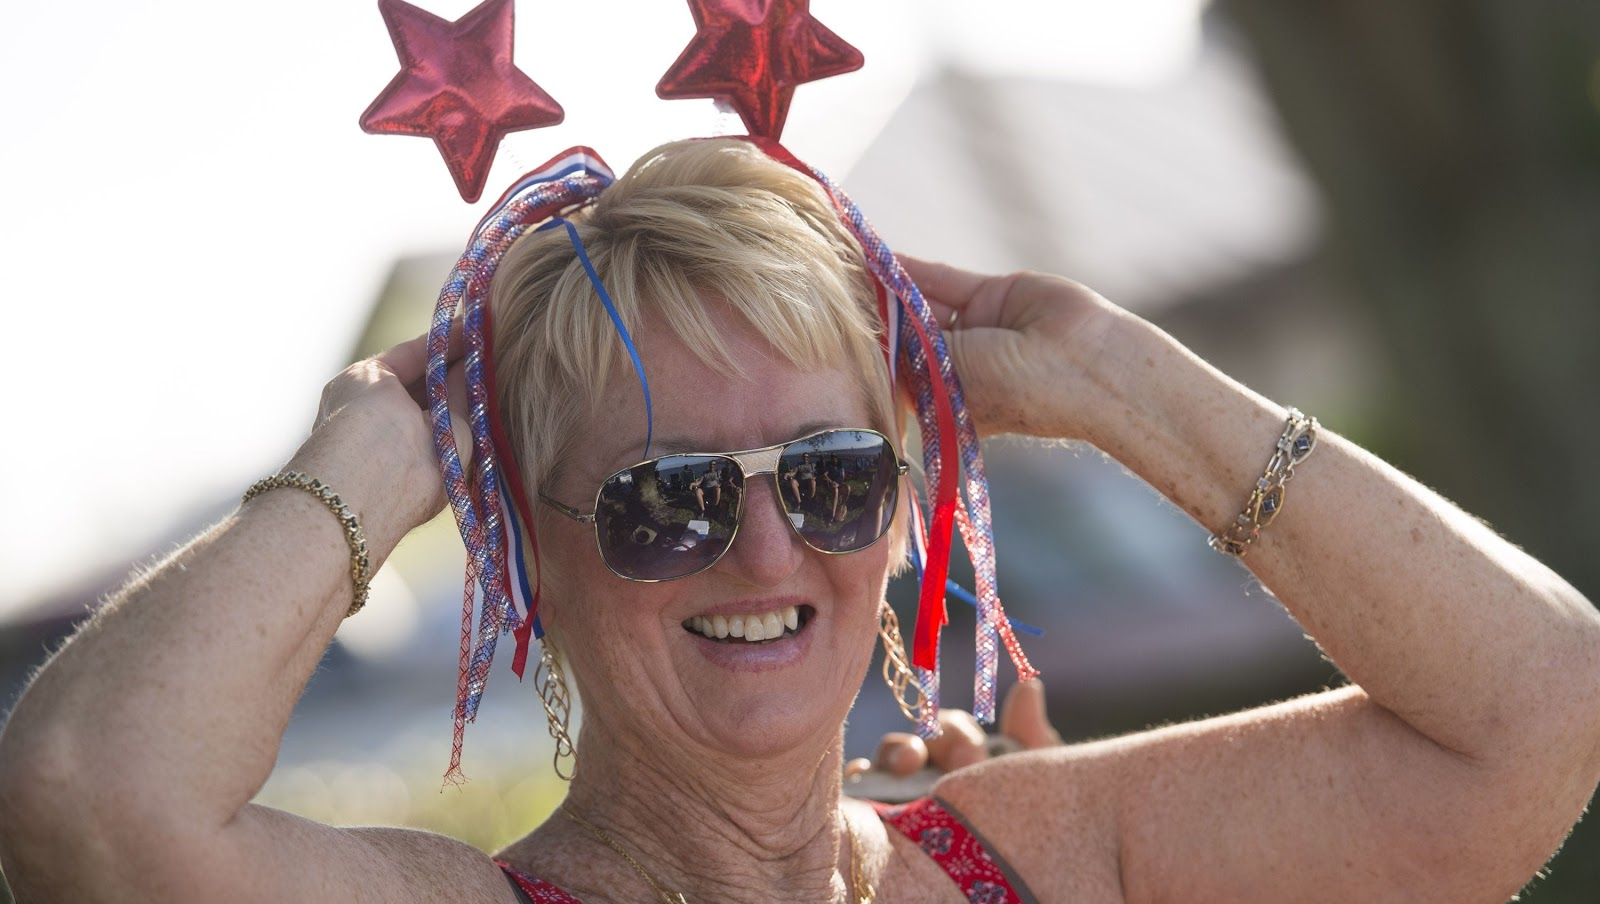 Festivals, fireworks and fun highlight Treasure Coast July 4 celebrations